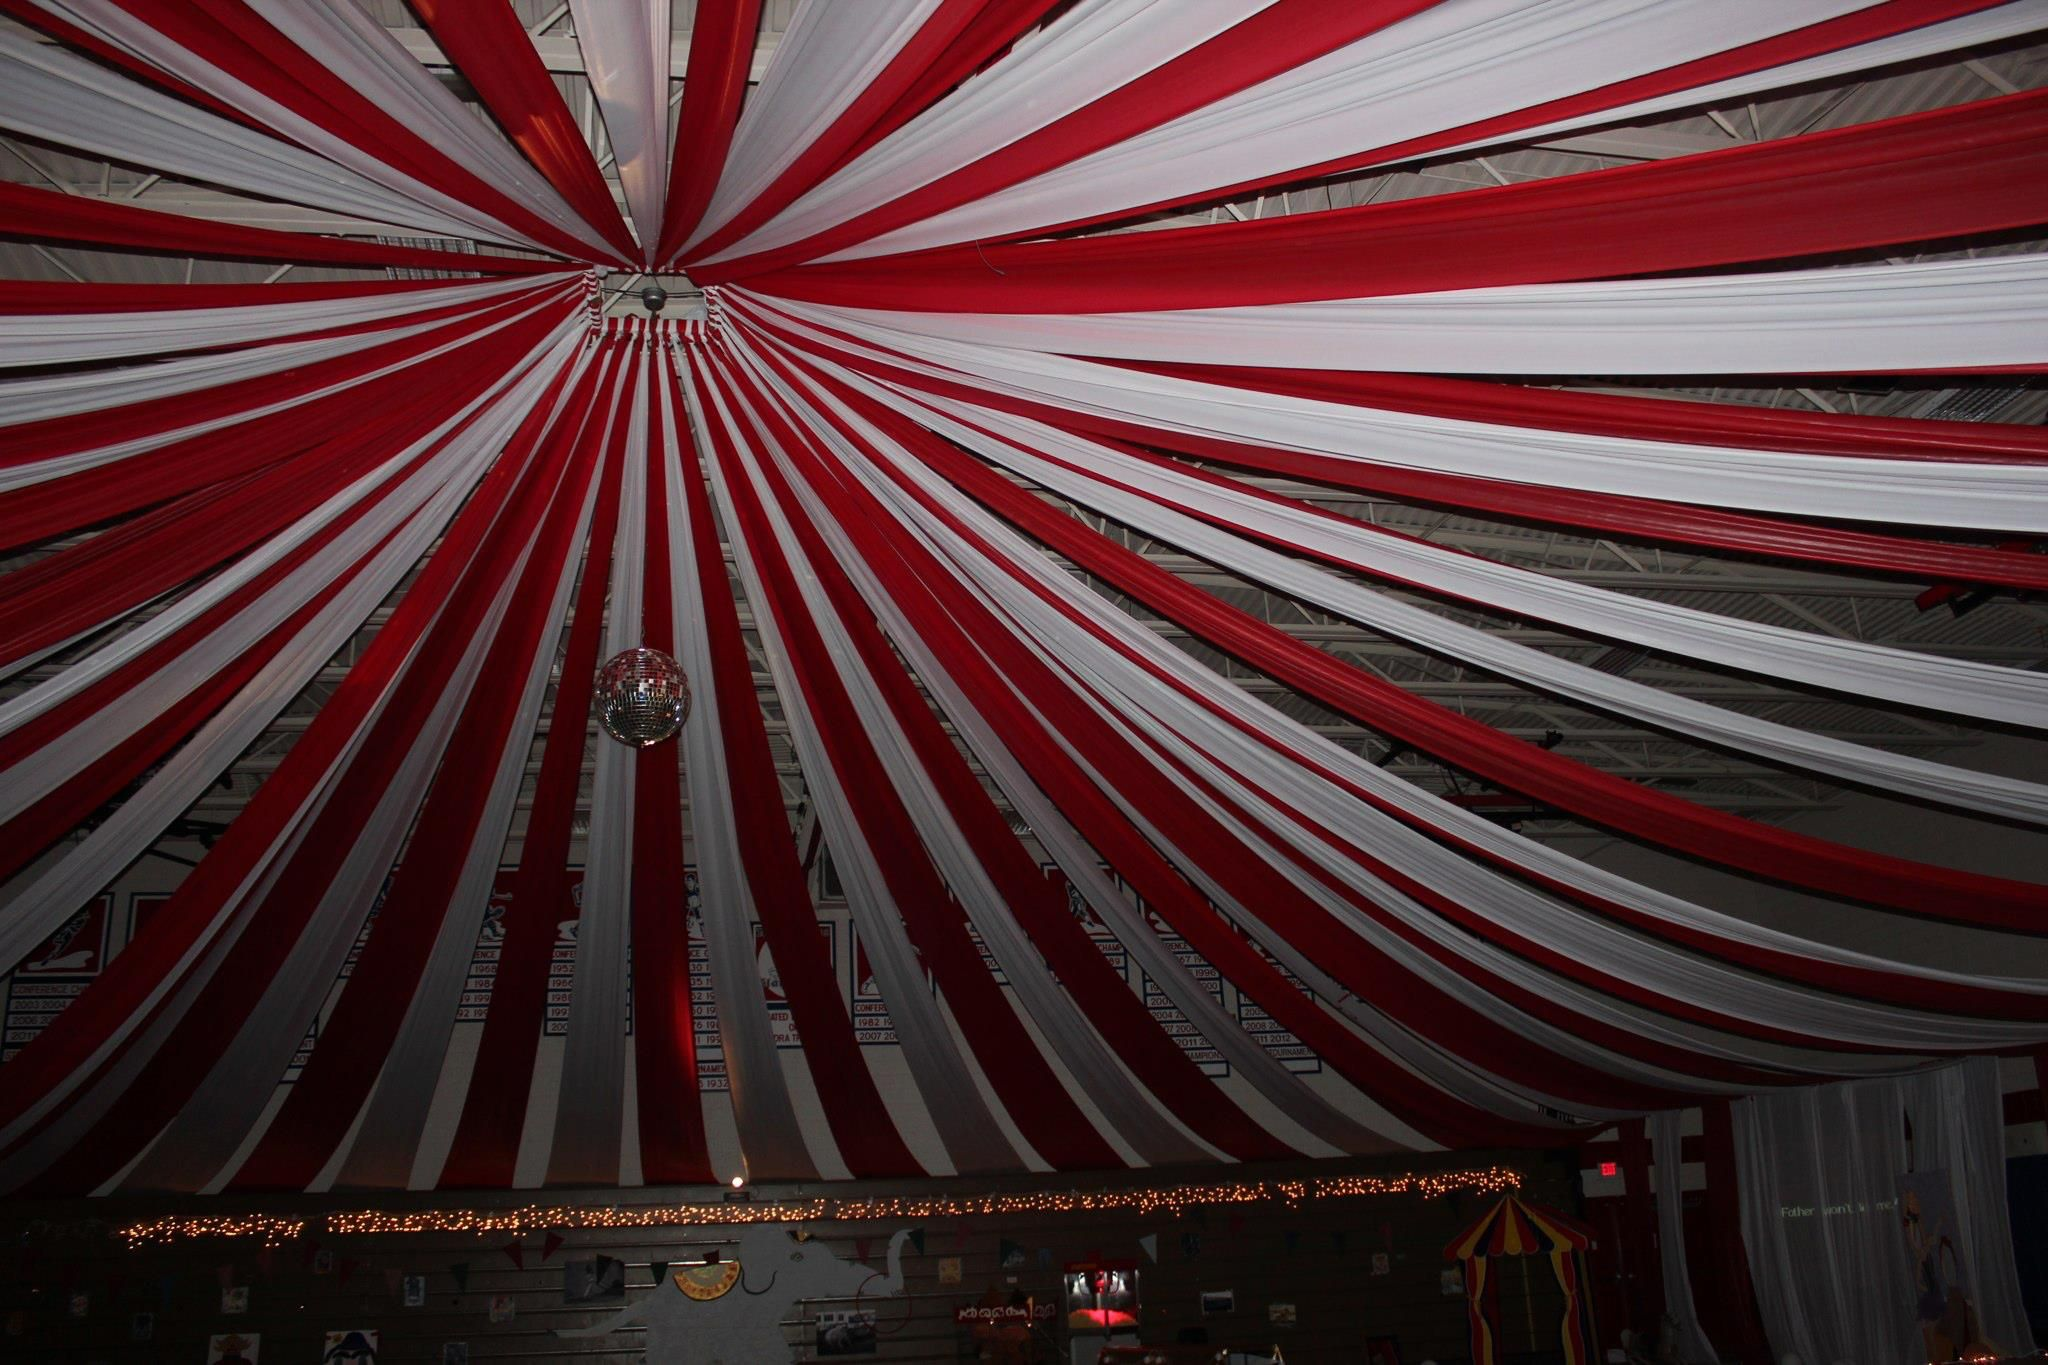 Diy Circus Tent Ceiling   www.energywarden.net